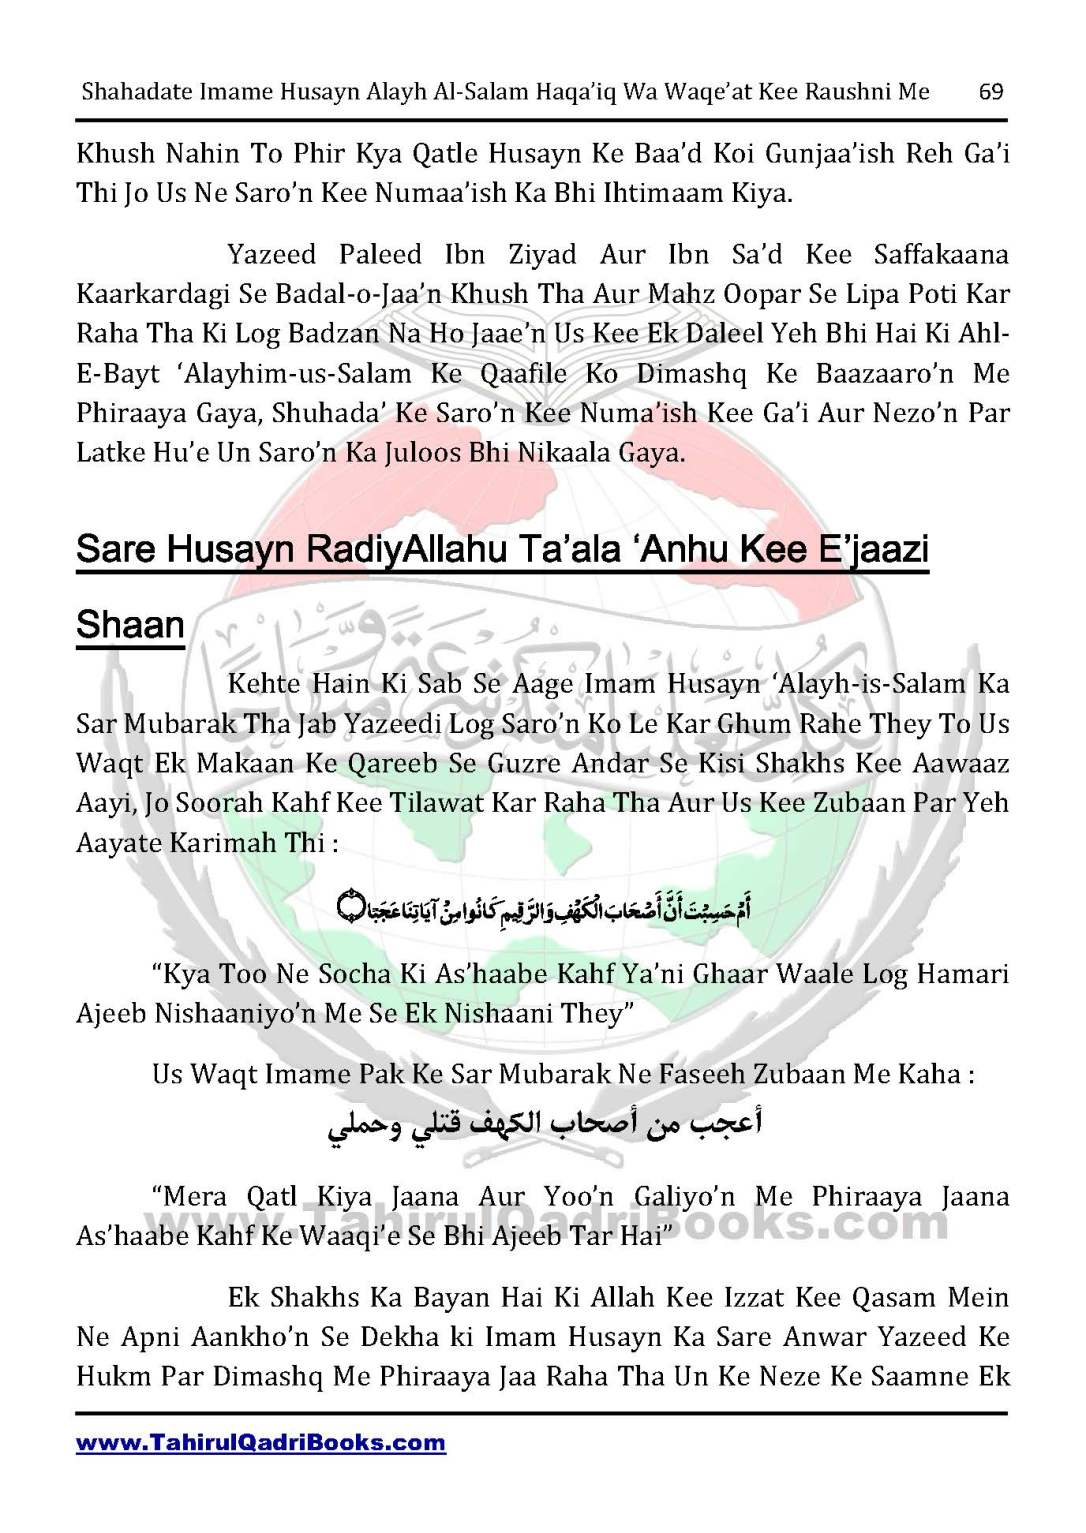 shahadate-imame-husayn-alayh-is-salam-haqaiq-wa-waqe_at-kee-raushni-me-in-roman-urdu-unlocked_Page_69